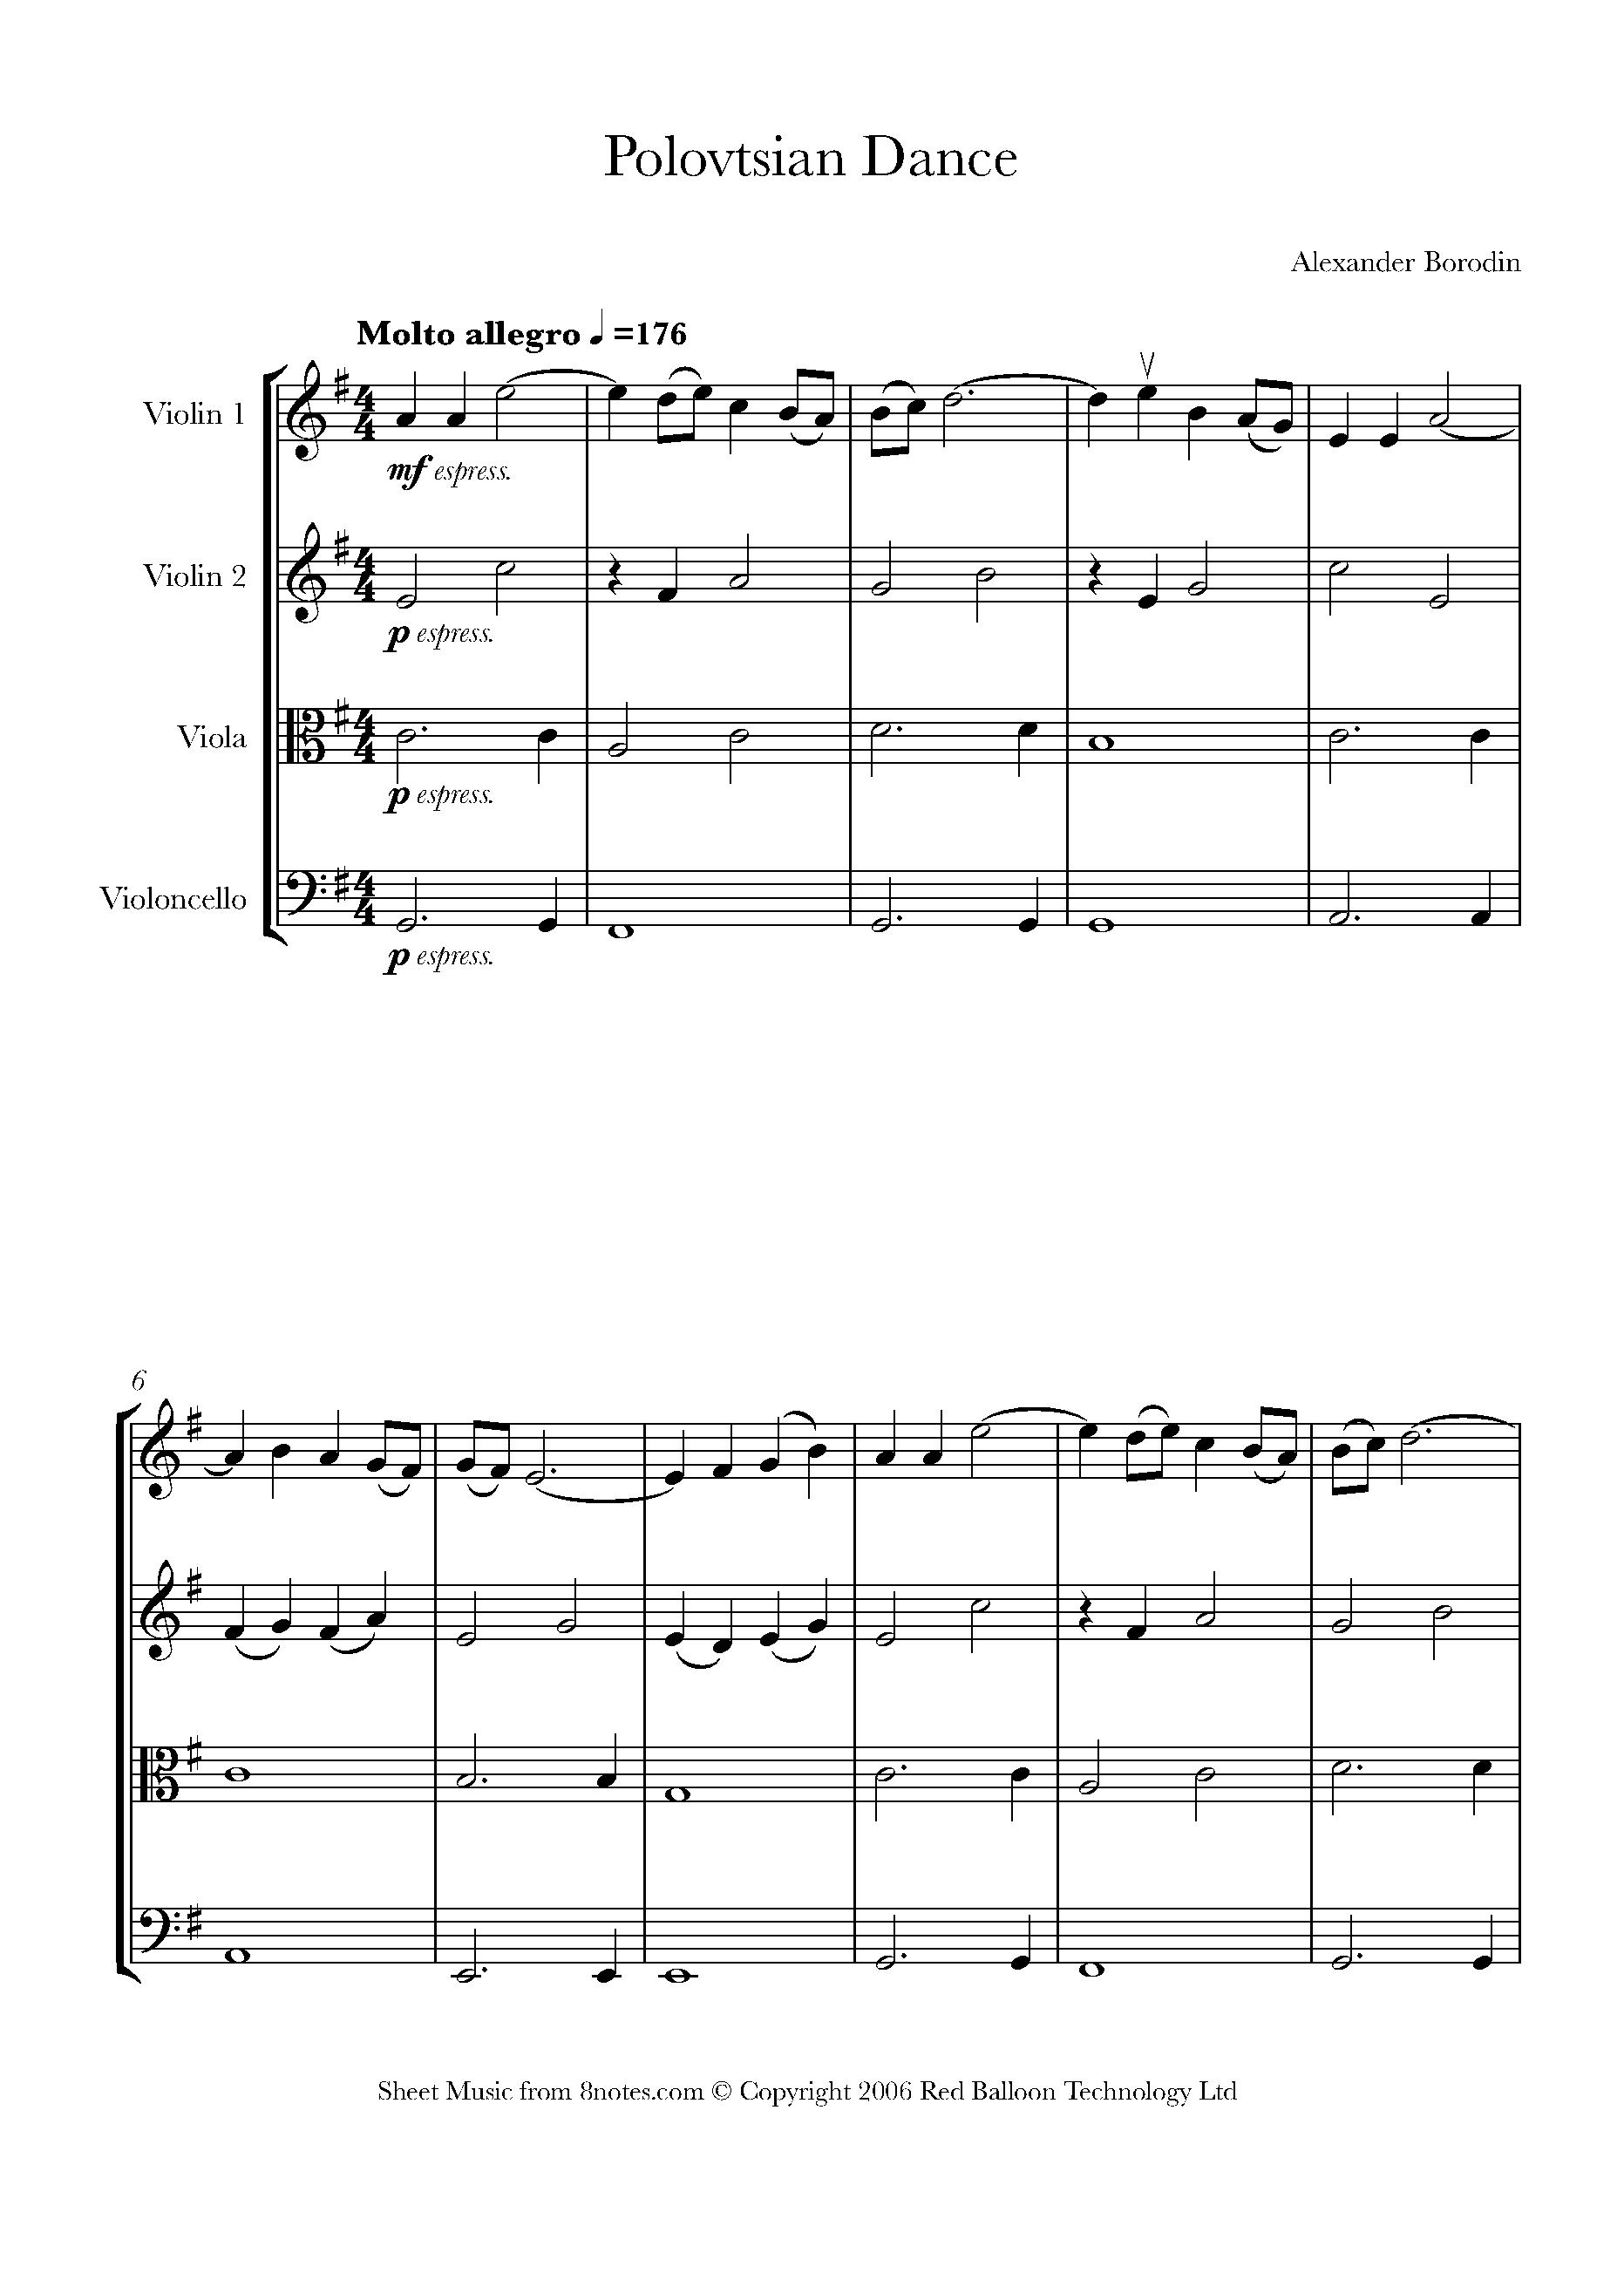 borodin - polovtsian dance sheet music for string quartet - 8notes.com  8notes